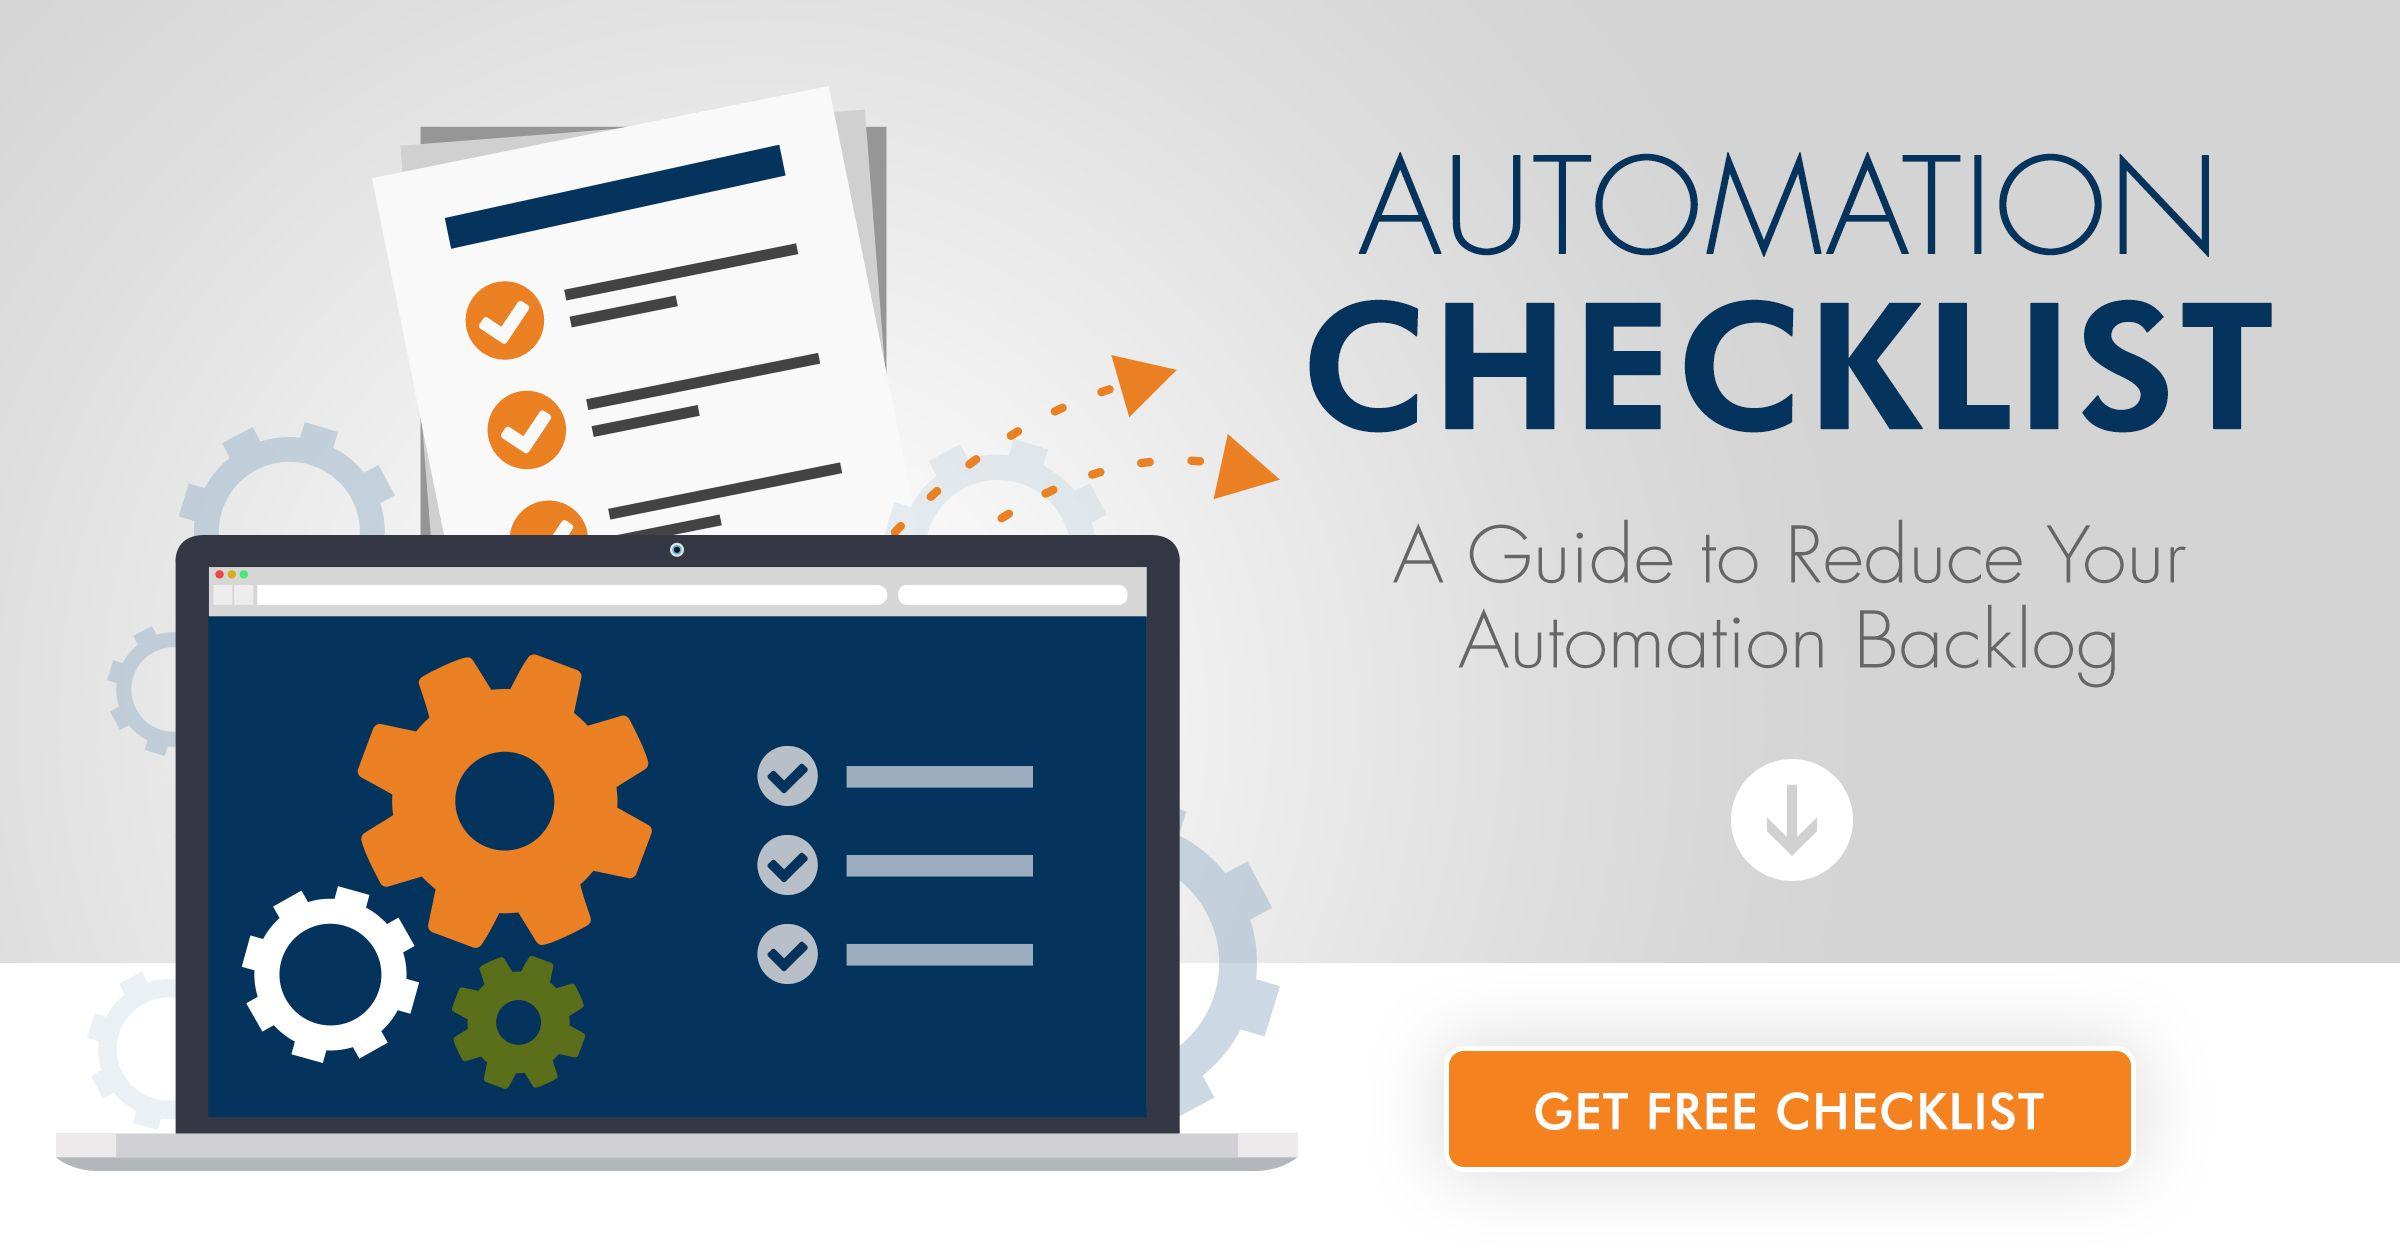 f4a2353db26f2b07775ec058f4d9cf8a - Web Application Testing Tools Free Download